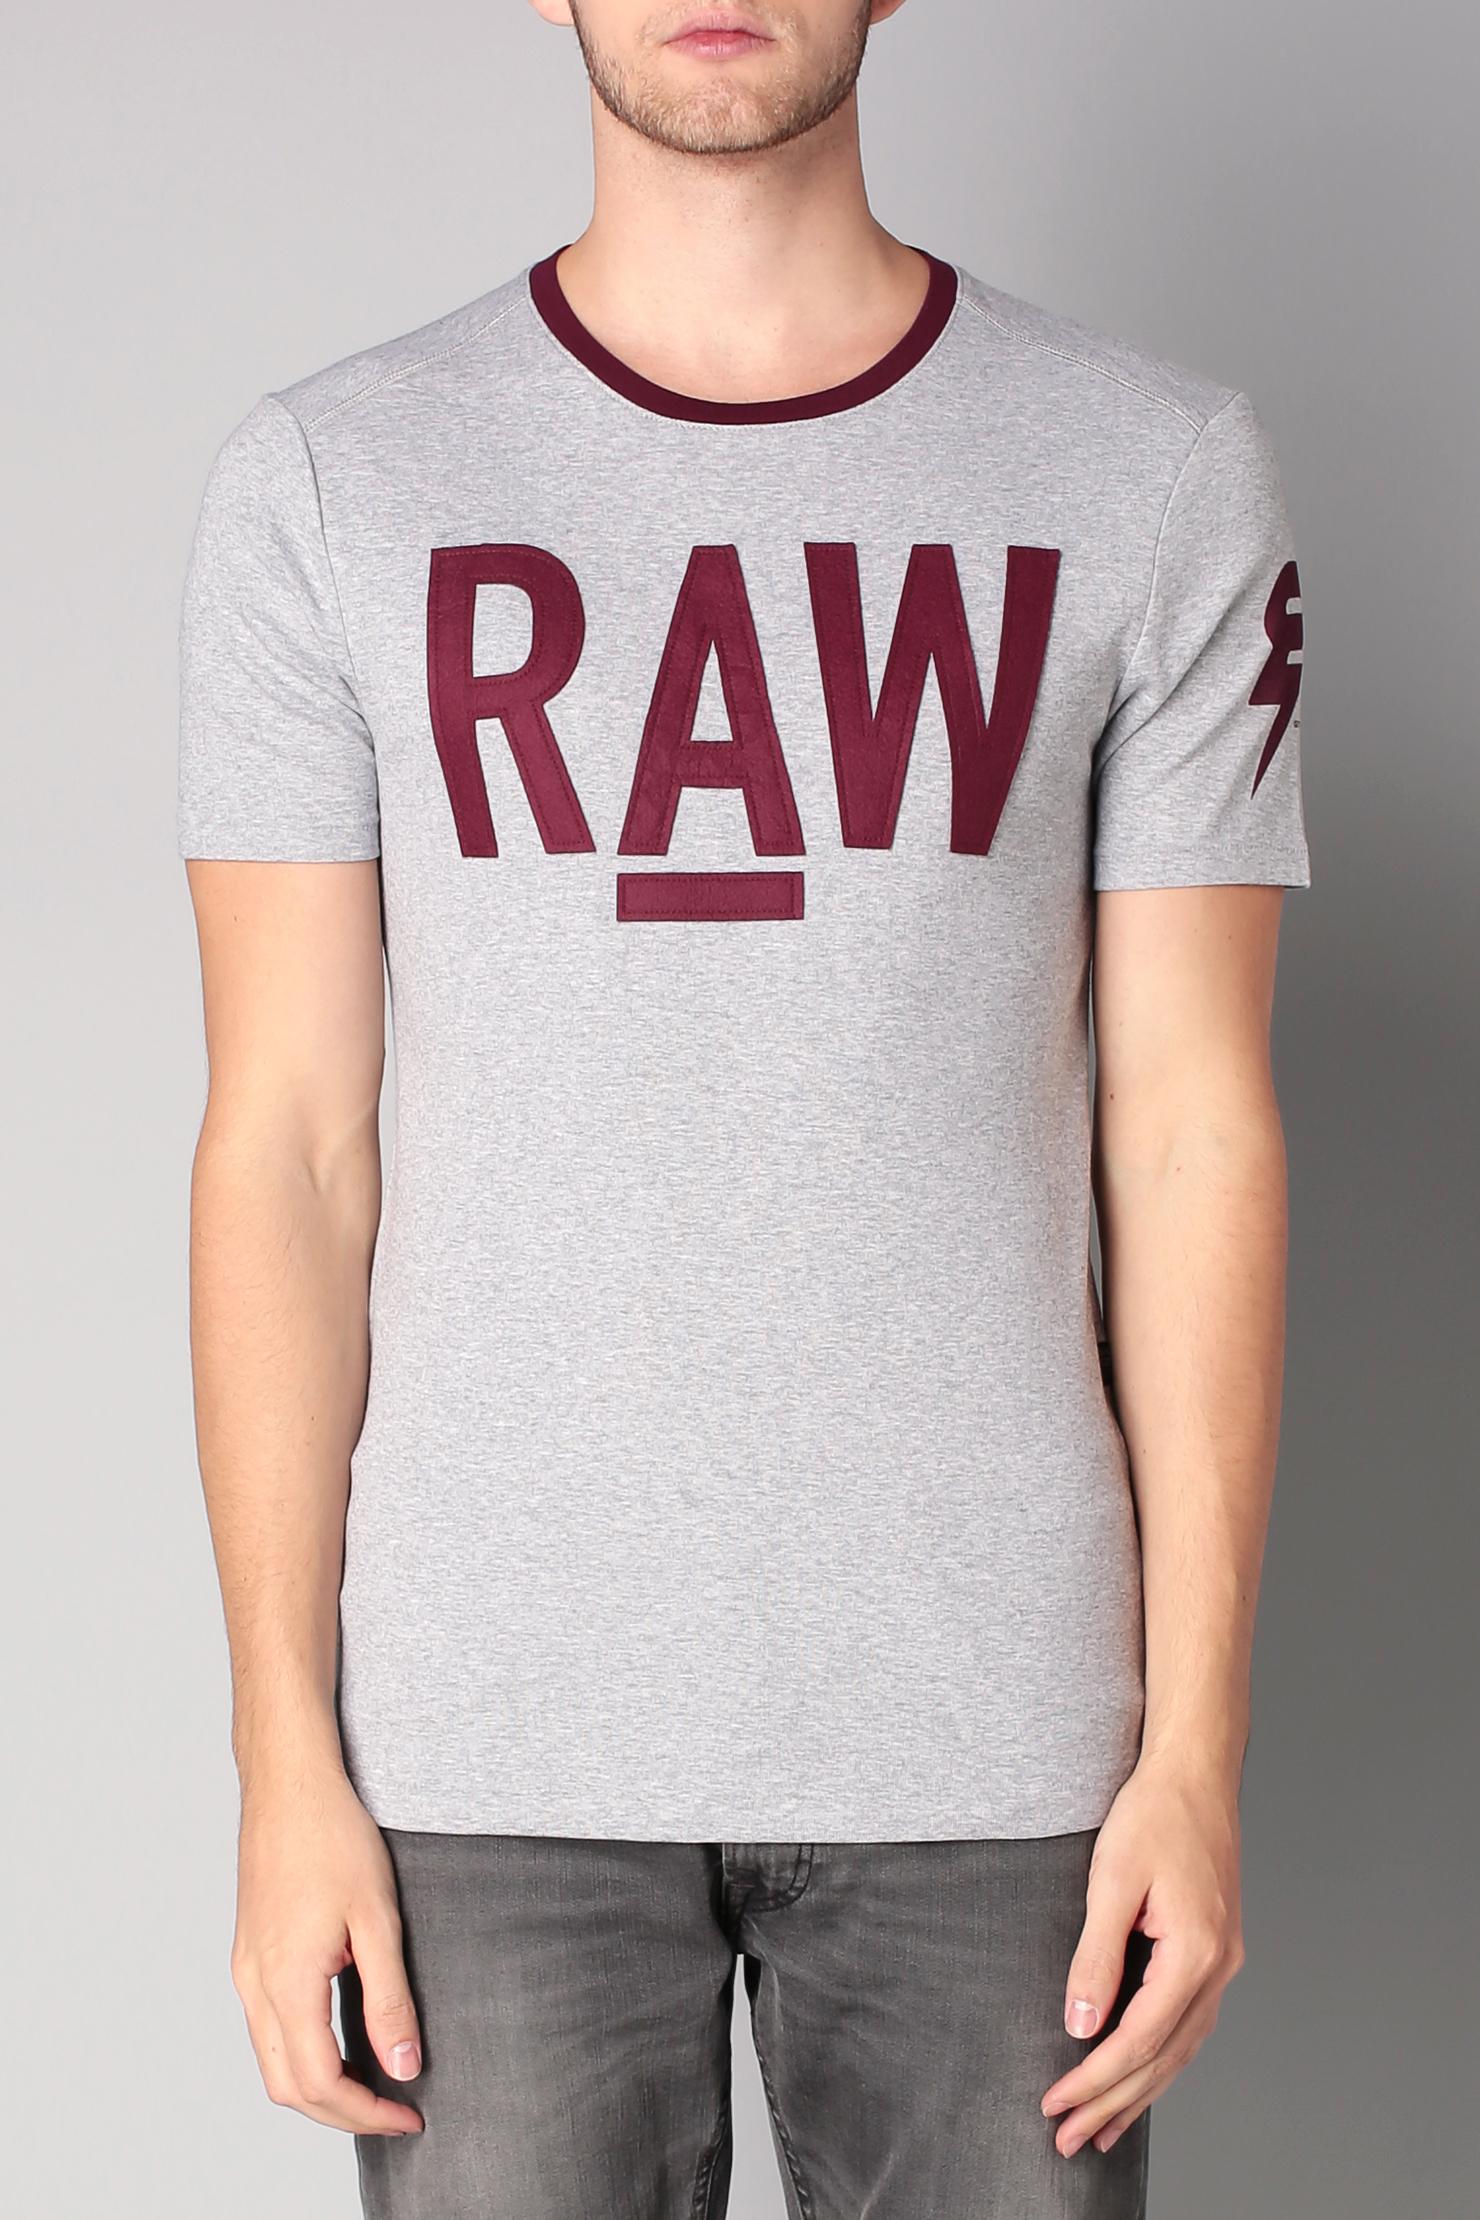 lyst g star raw short sleeve t shirt in gray for men. Black Bedroom Furniture Sets. Home Design Ideas